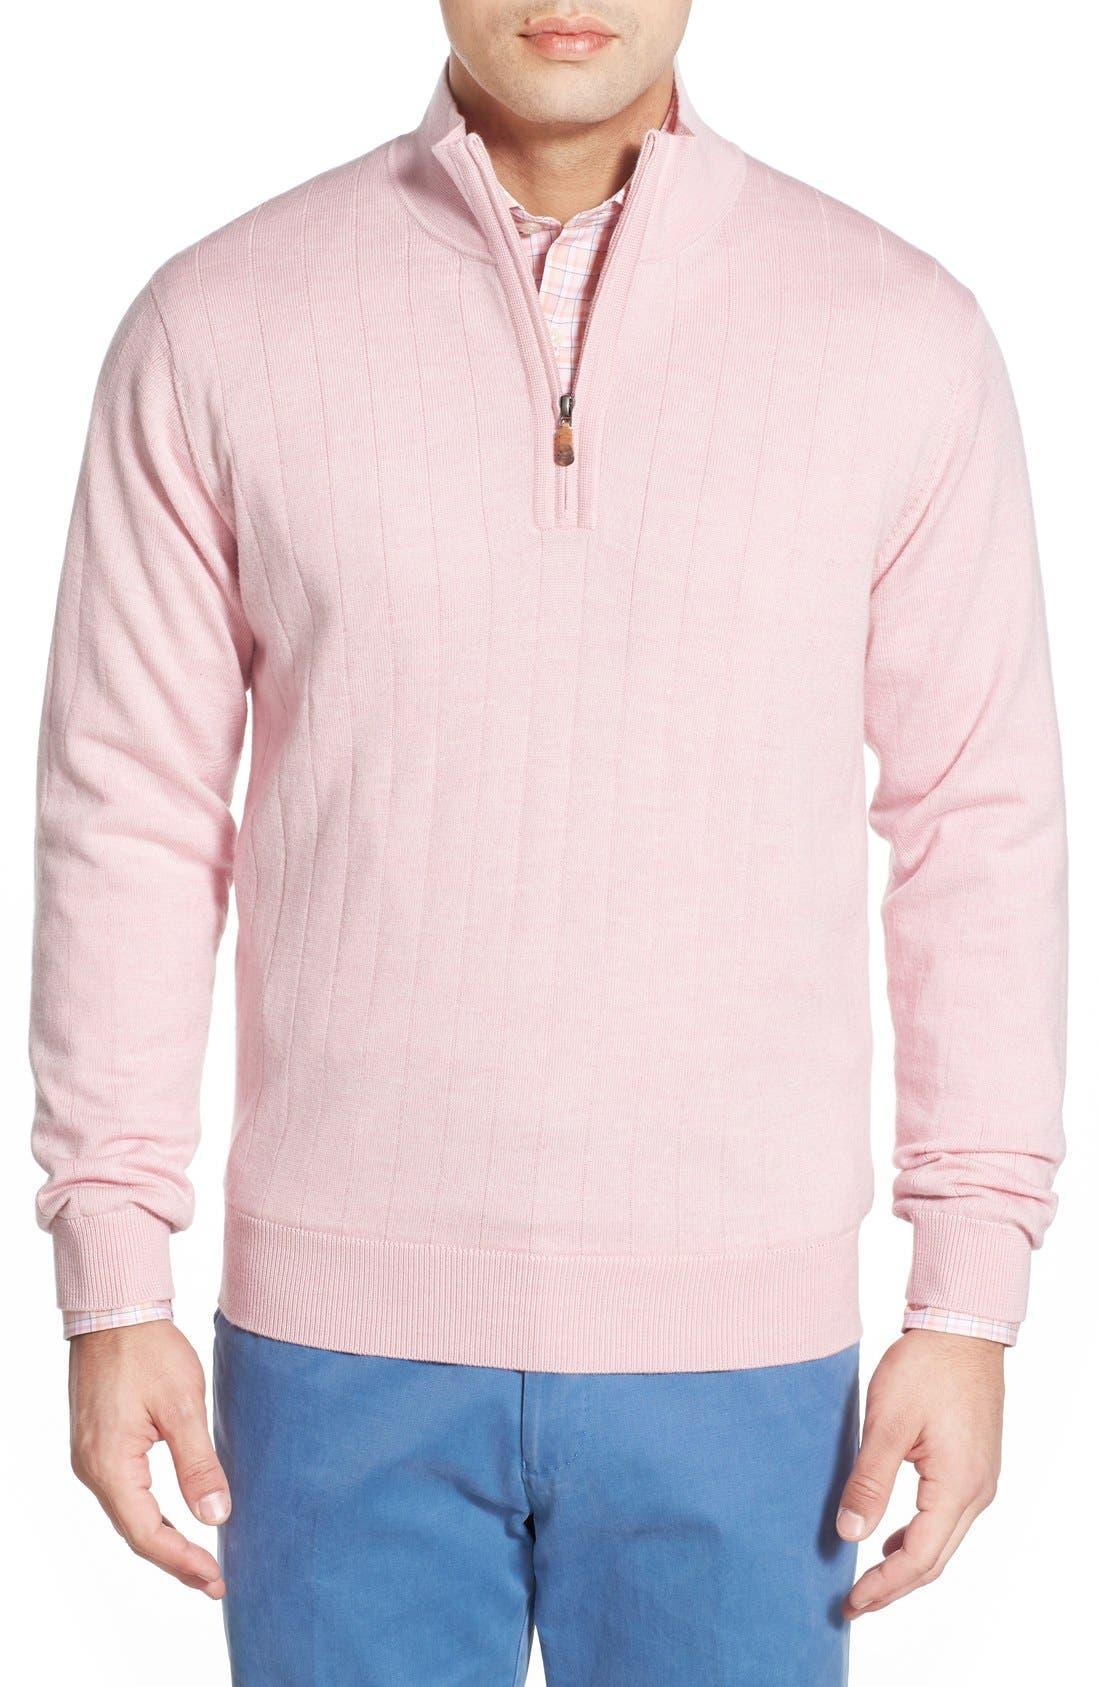 Windproof Merino Wool Quarter Zip Sweater,                         Main,                         color, Pale Pink